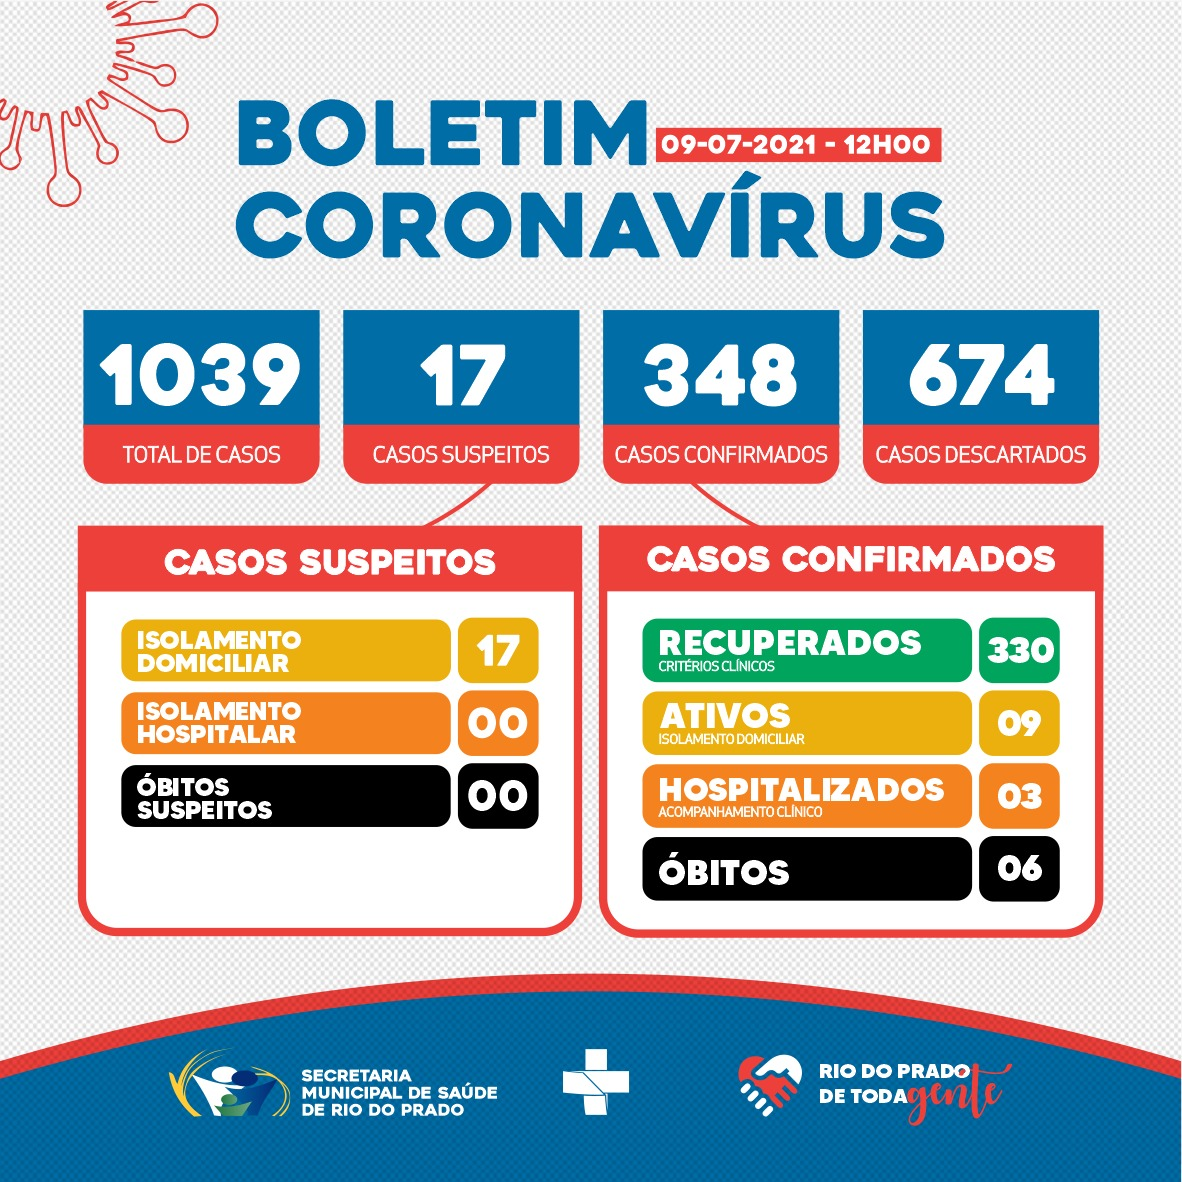 BOLETIM EPIDEMIOLÓGICO CORONAVÍRUS - 09/07/2021